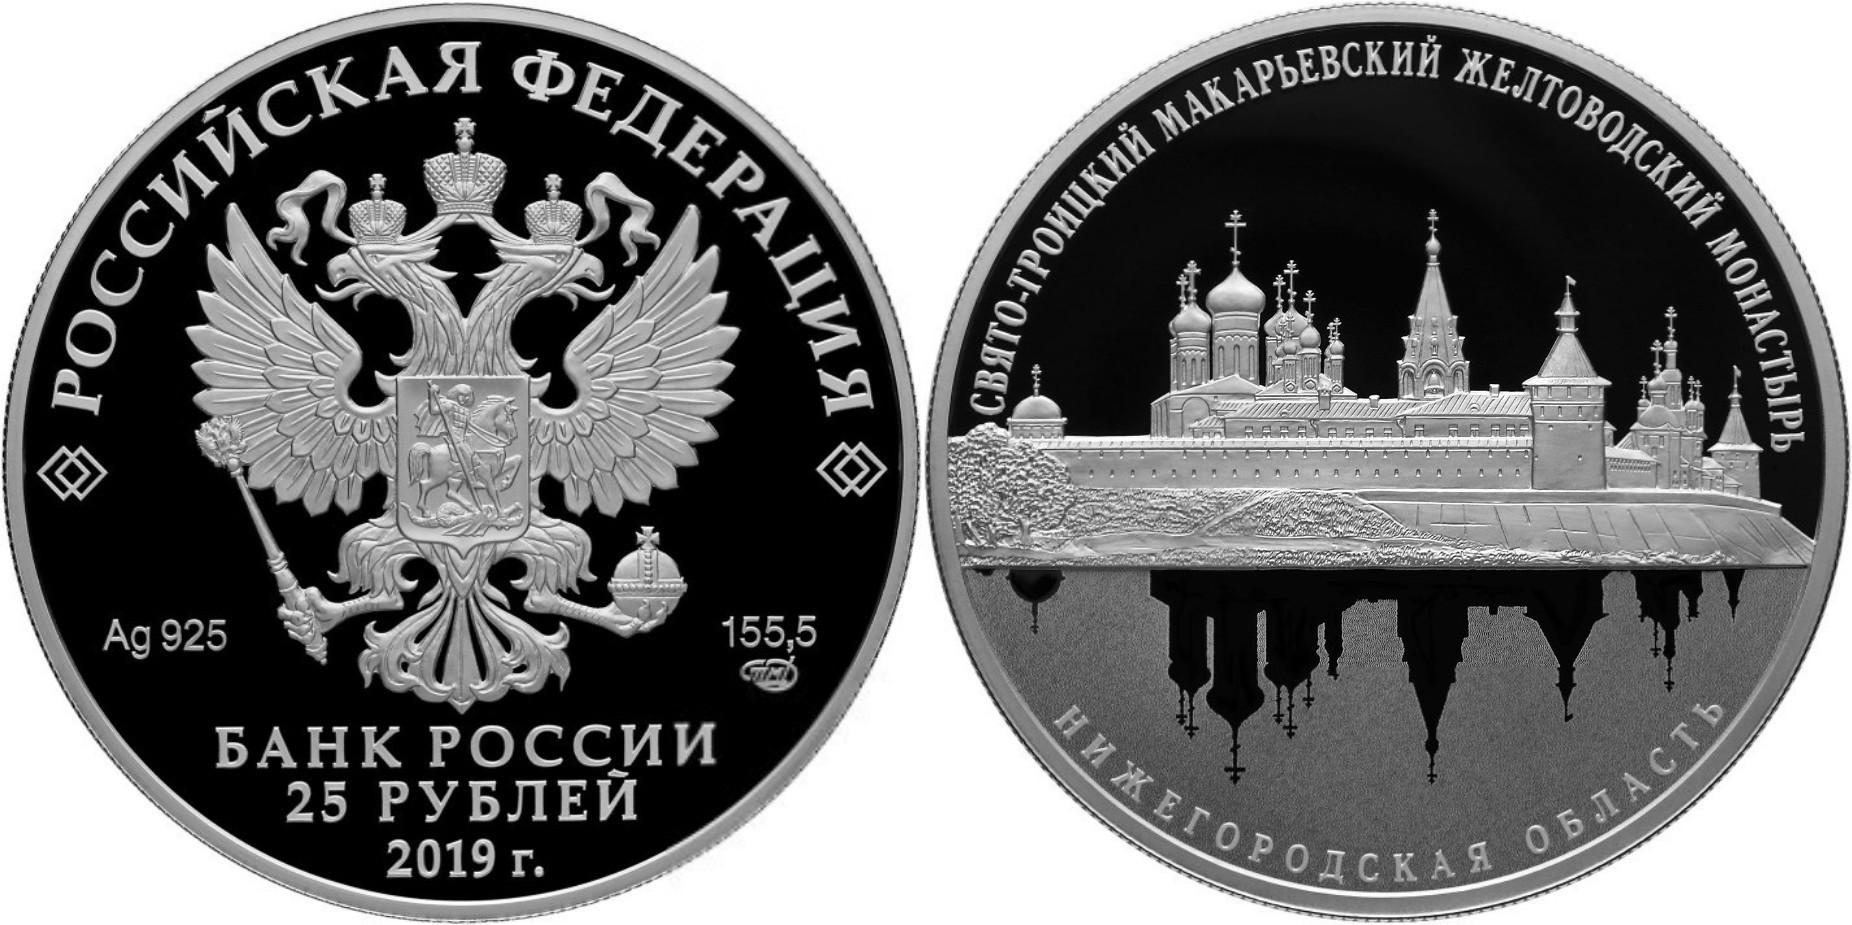 russie-2019-couvent-Zheltovodsky-Makaryev